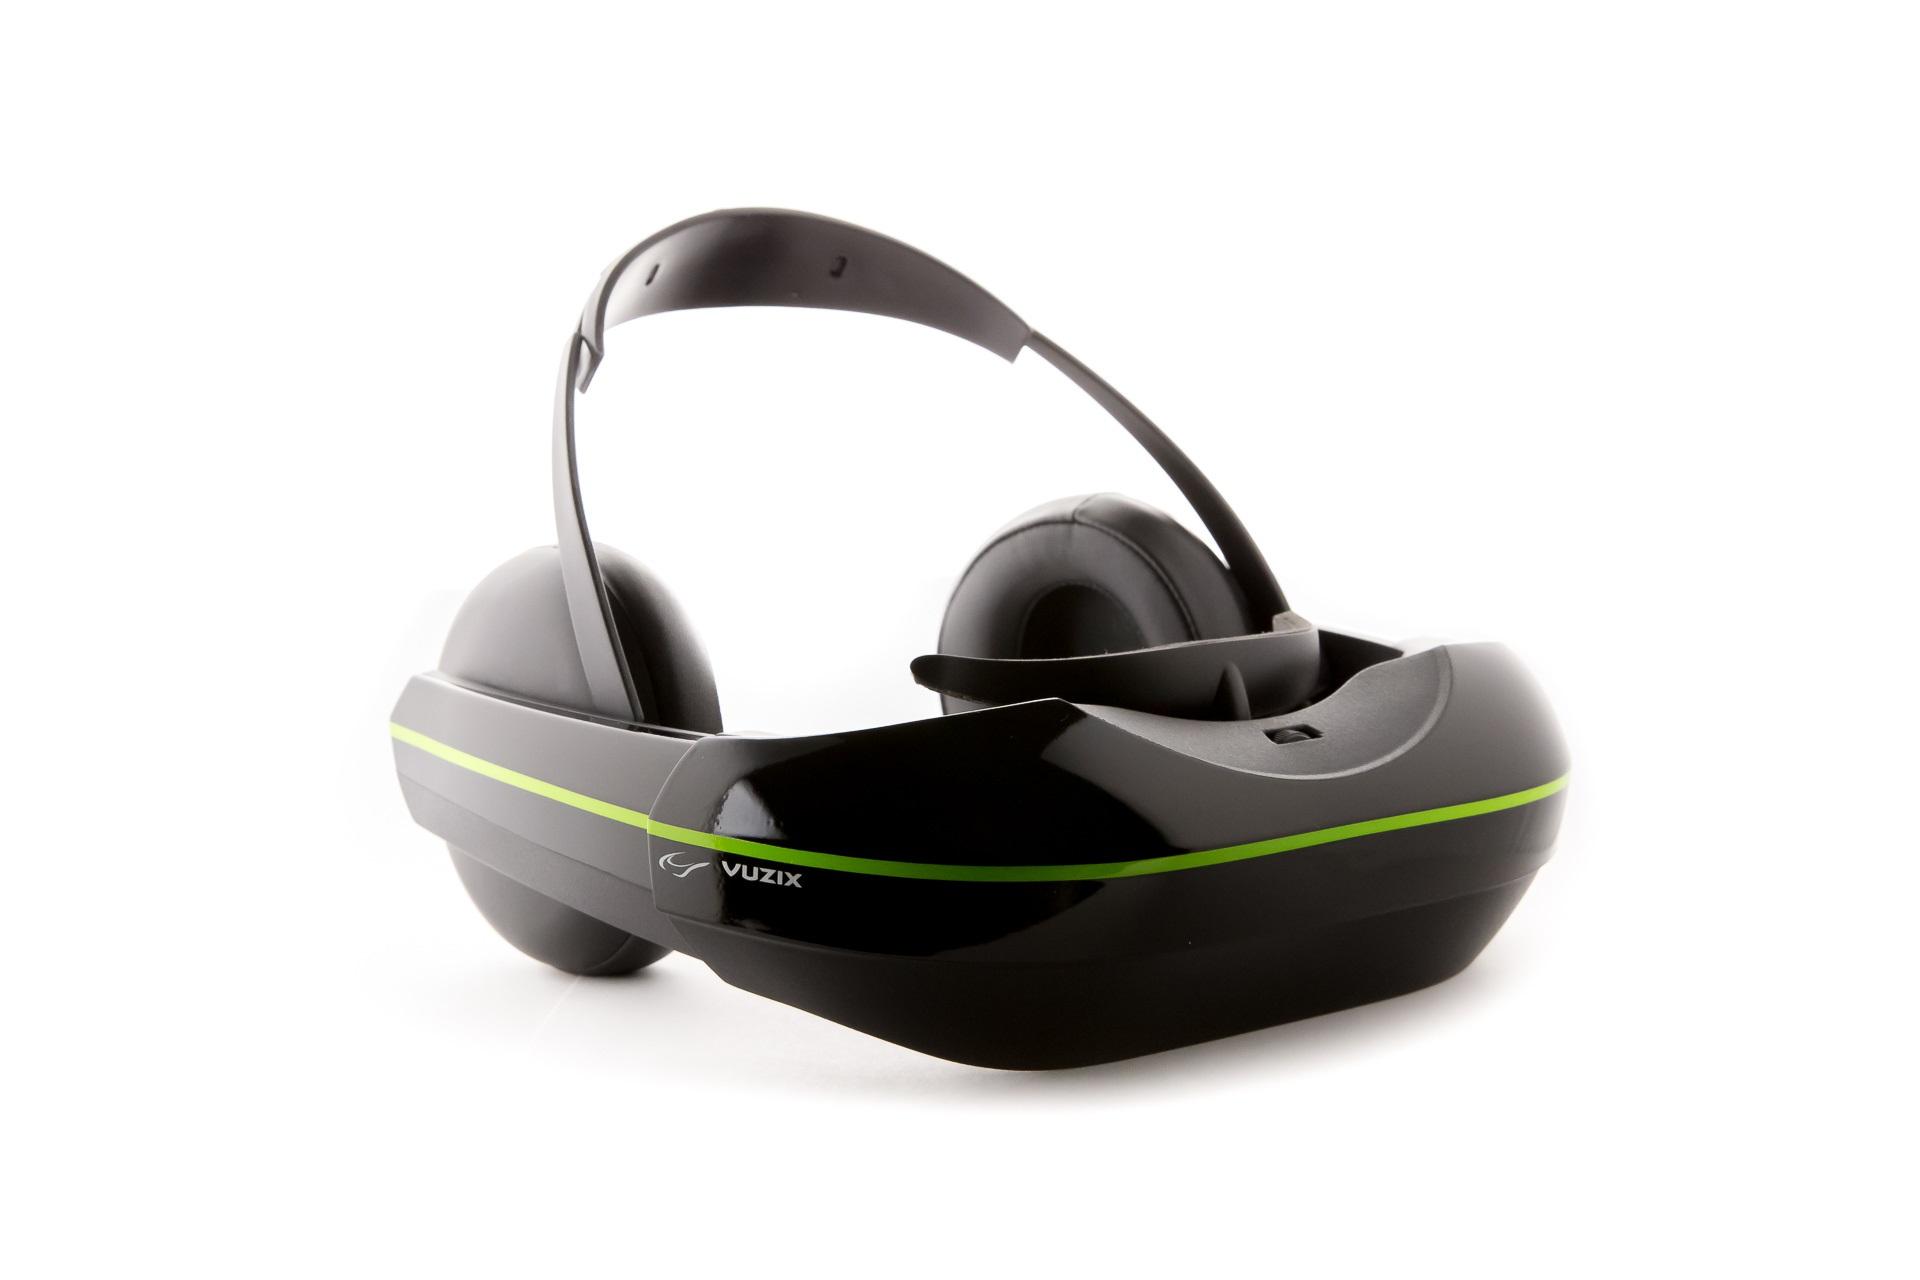 vuzix-iwear-headset-audio-video-gdc-2015